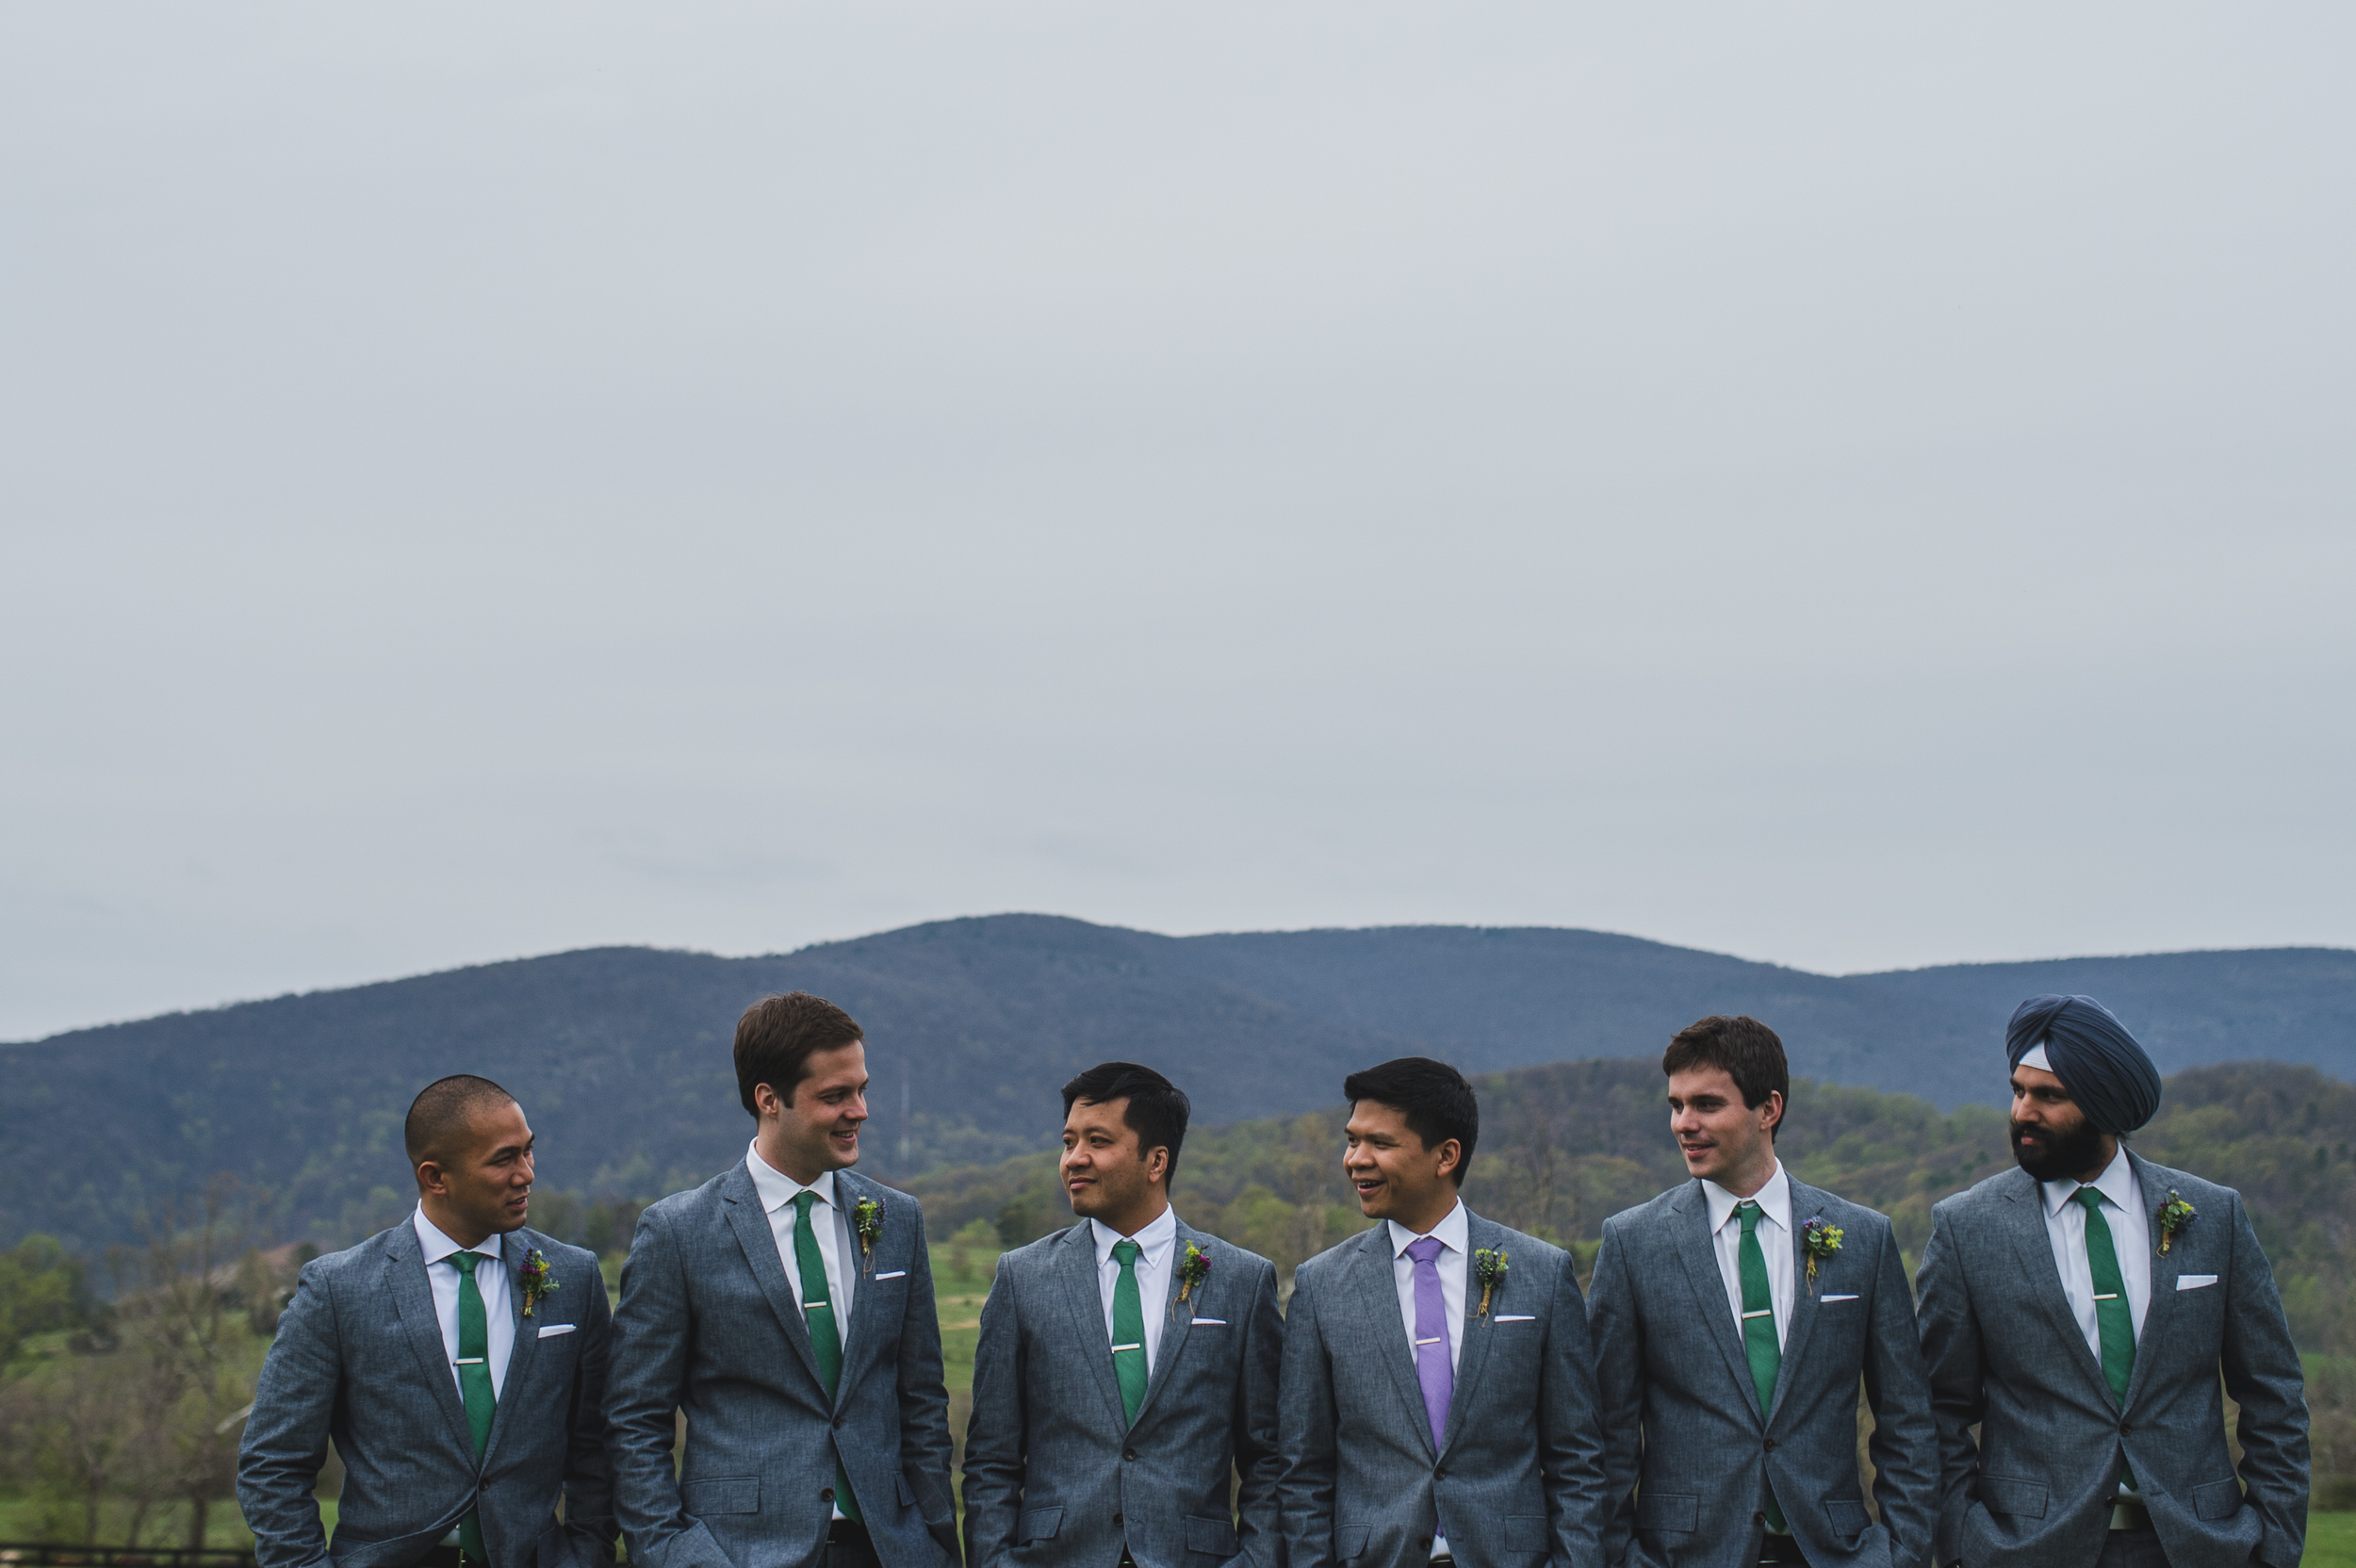 Photojournalistic wedding photography Baltimore MD By Mantas Kubilinskas-9.jpg